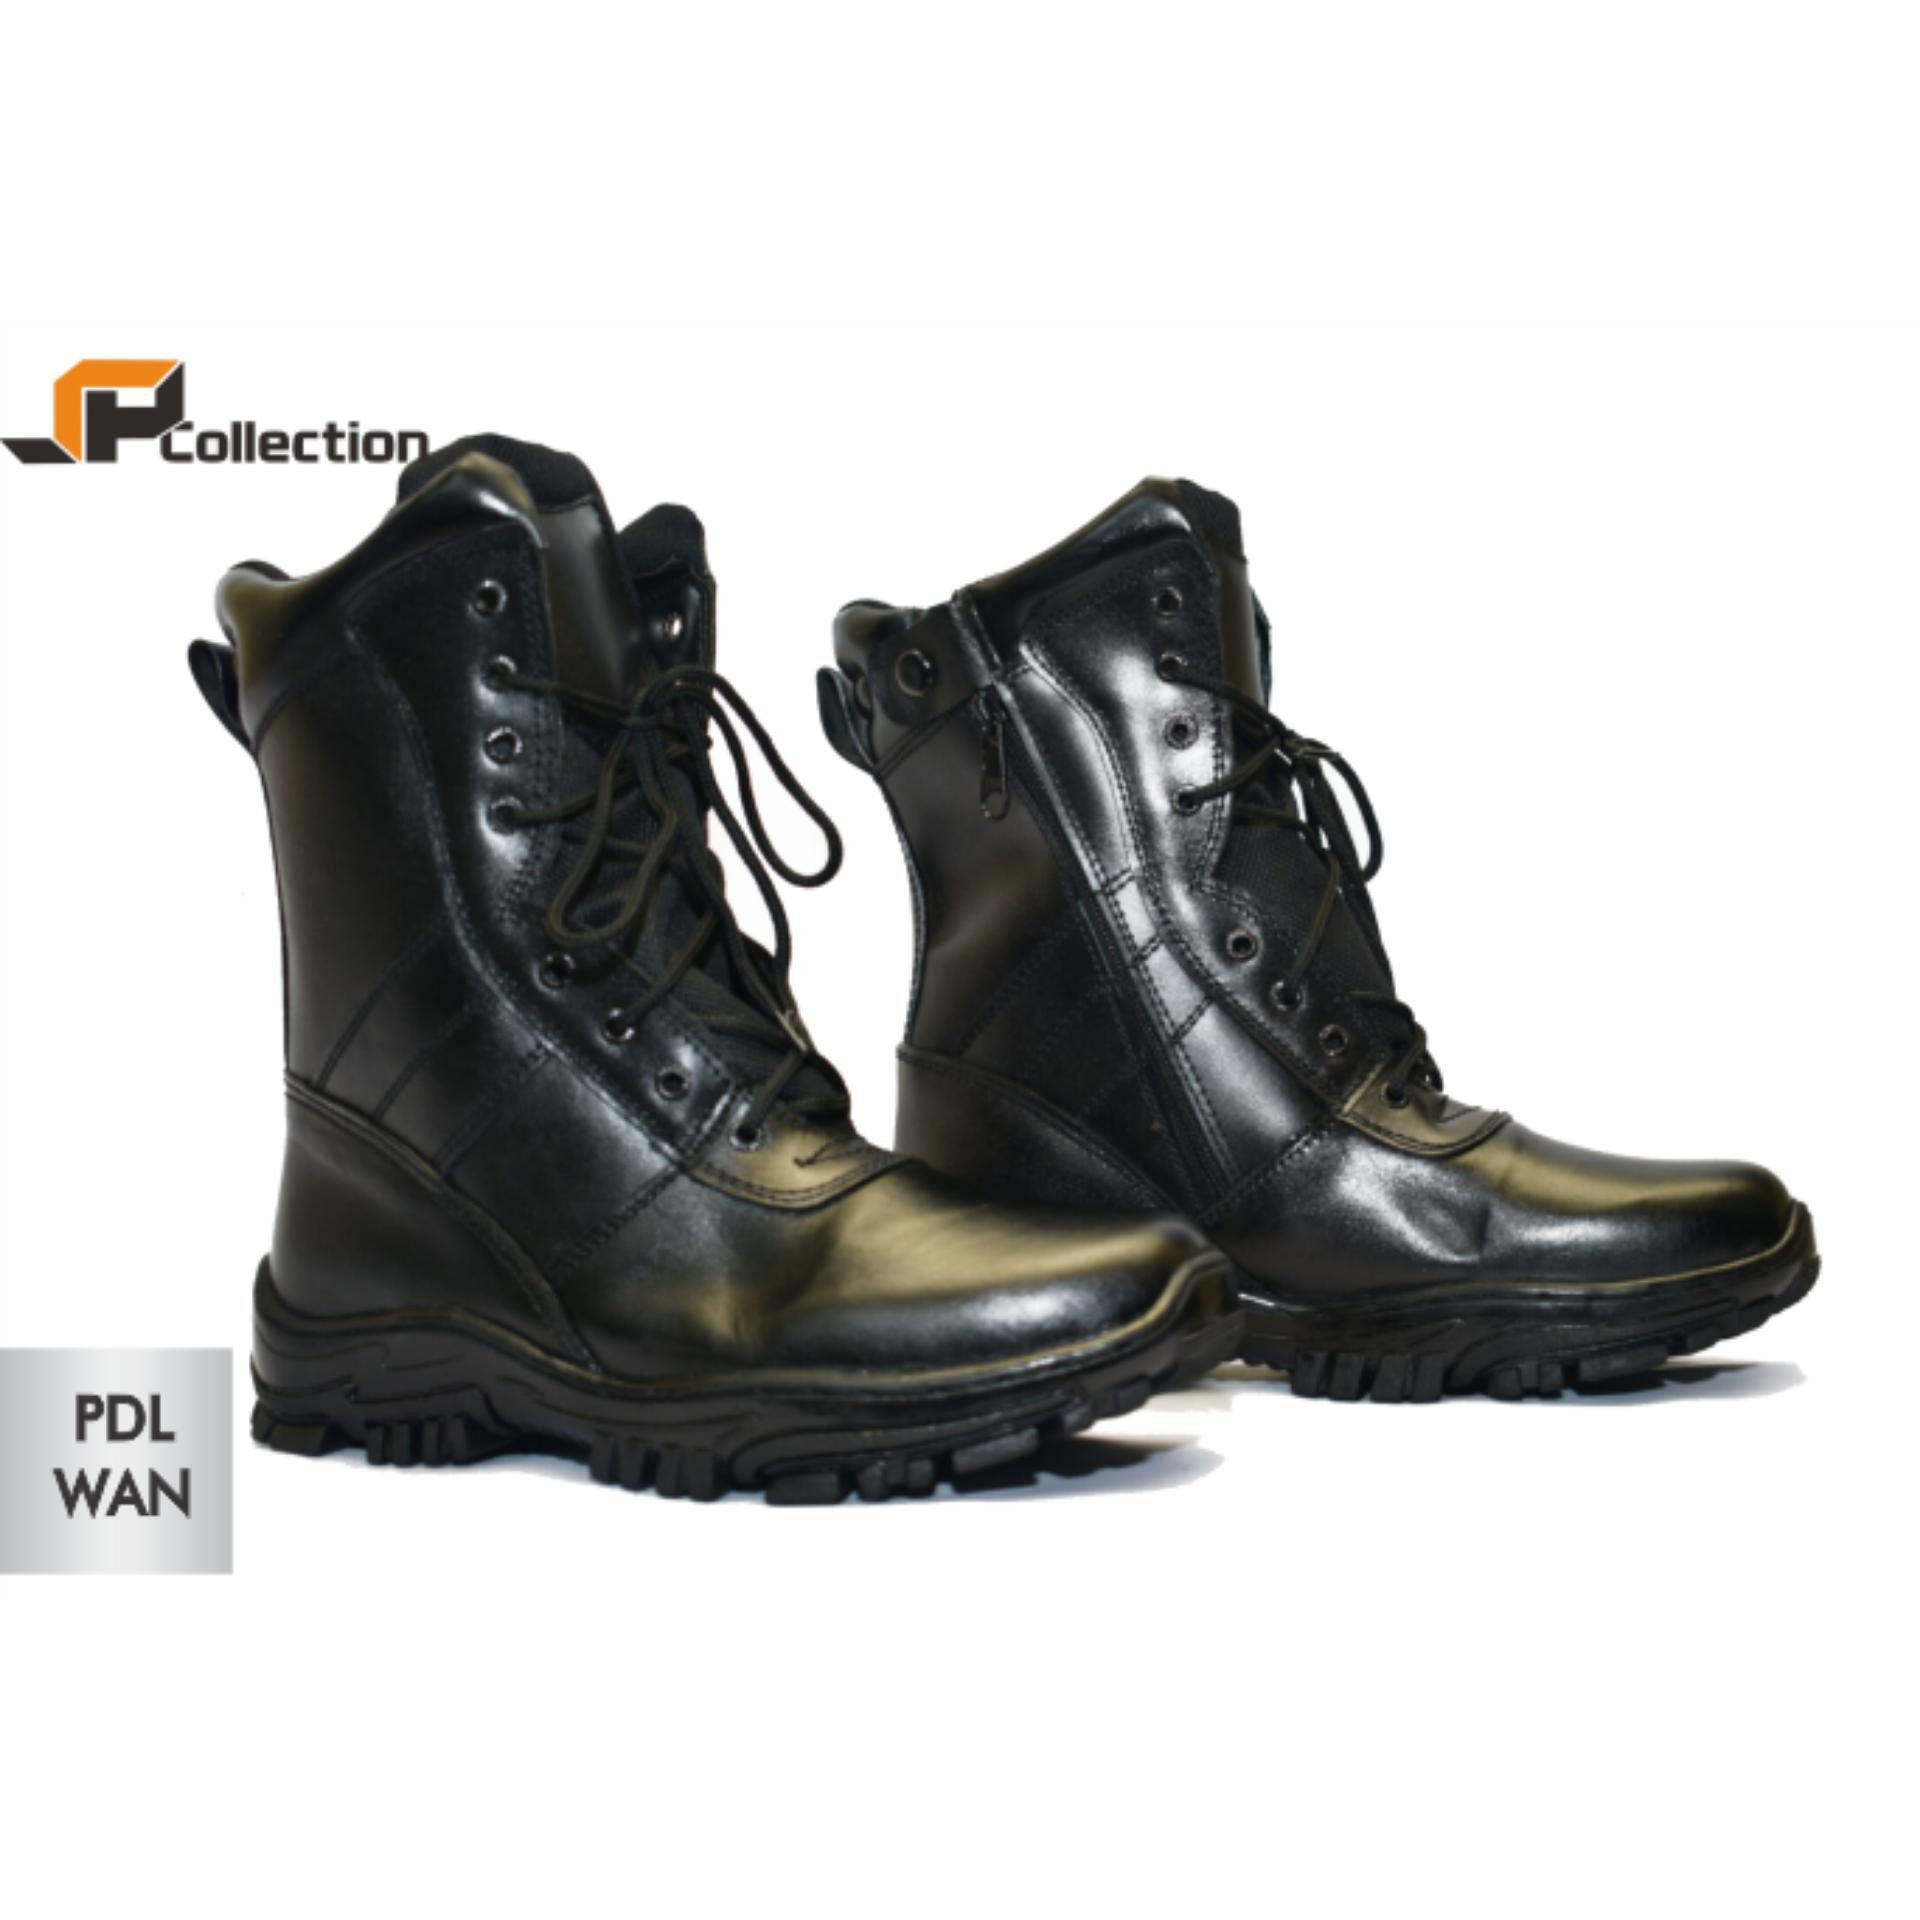 ... JAFERI Sepatu Boots PDL Wan Warna Hitam Bahan Kulit Sapi Asli Cocok  Untuk Touring a01ac49ce8